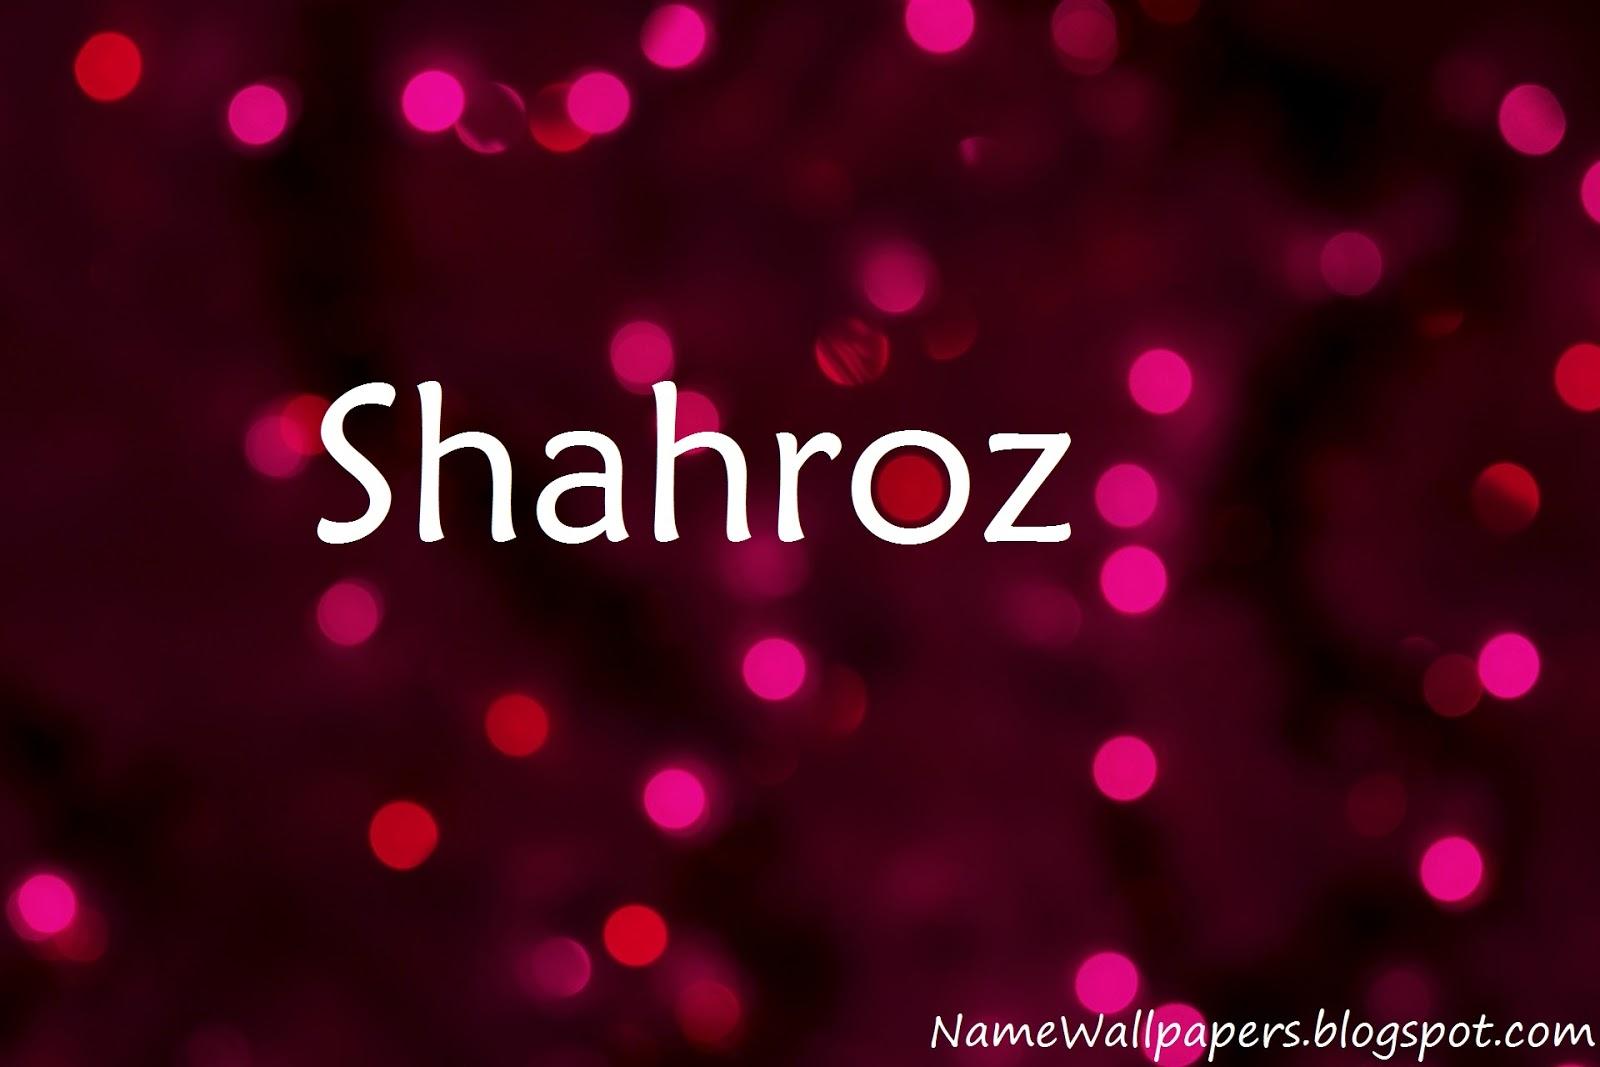 shahroz name